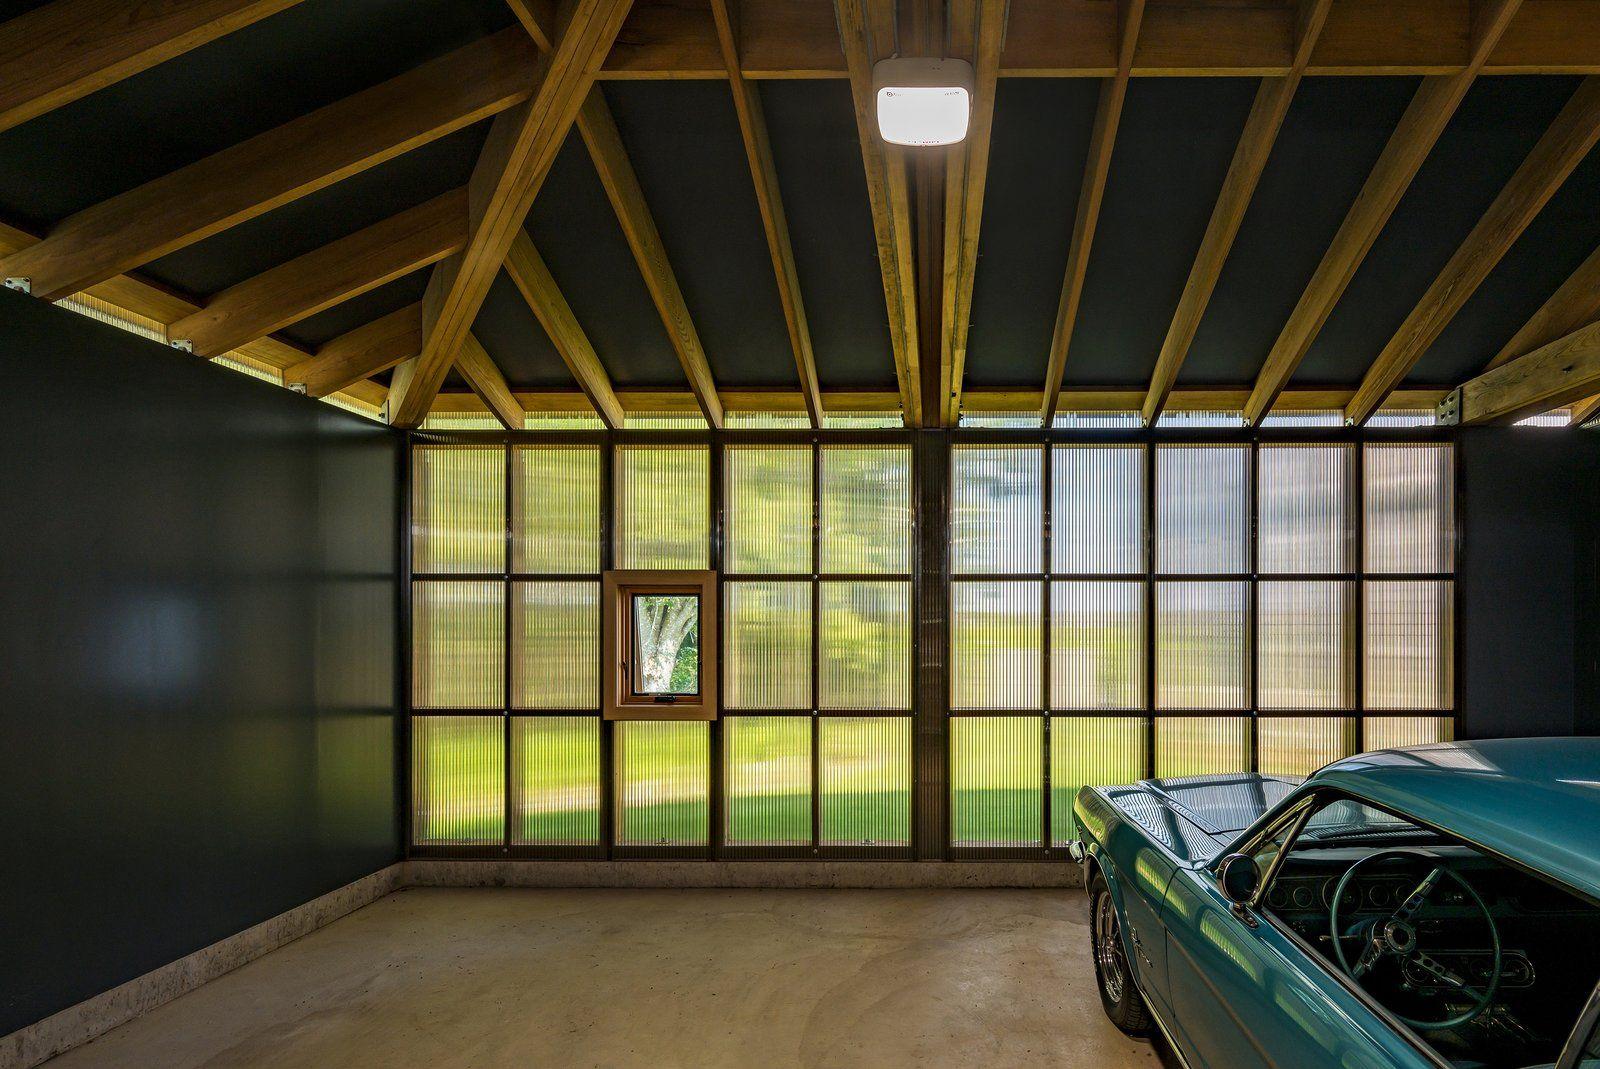 Photo 3 Of 5 In Top 5 Homes Of The Week With Revved Up Garages From Garage Design Modern Garage Design Garage Makeover